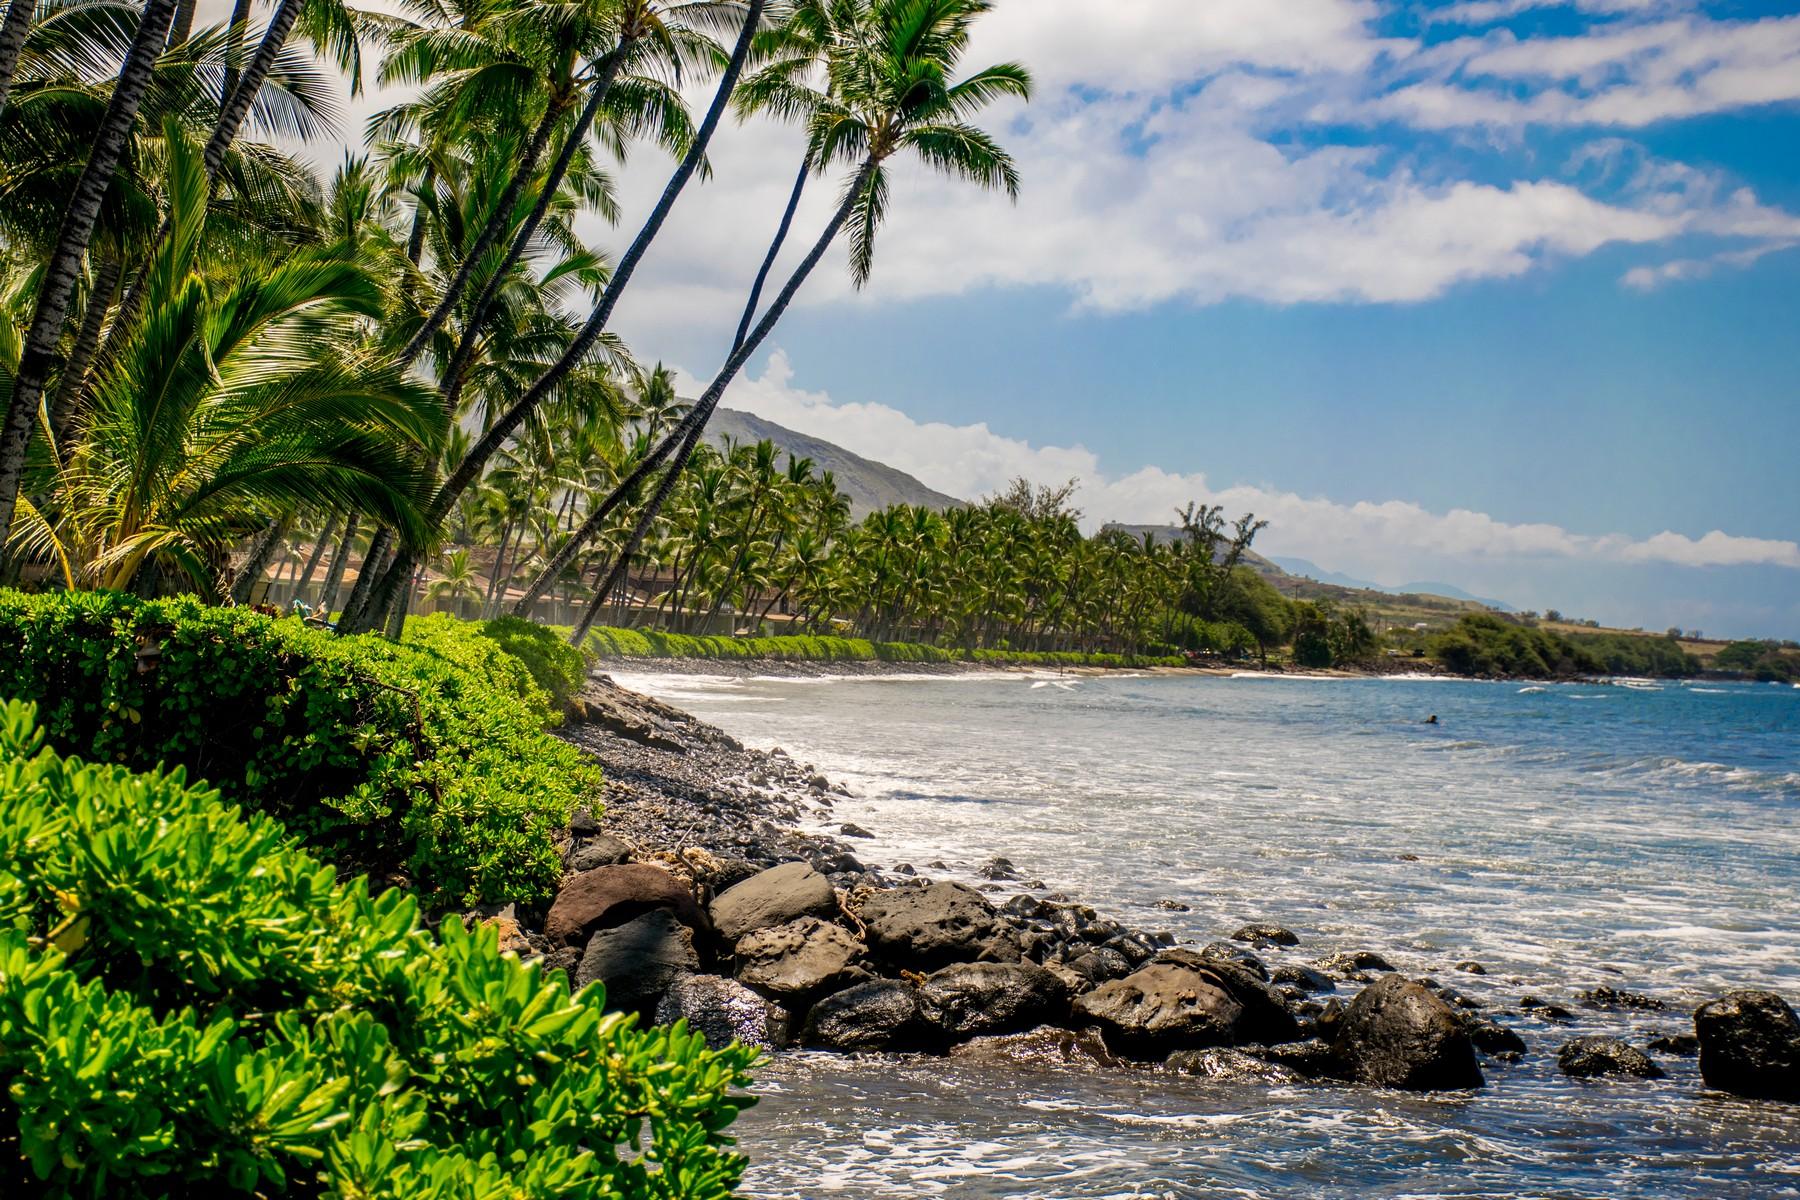 Nhà phố vì Bán tại Extraordinary Oasis in Puamana - Maui 55-4 Puapake Place, Puamana Lahaina, Hawaii, 96761 Hoa Kỳ